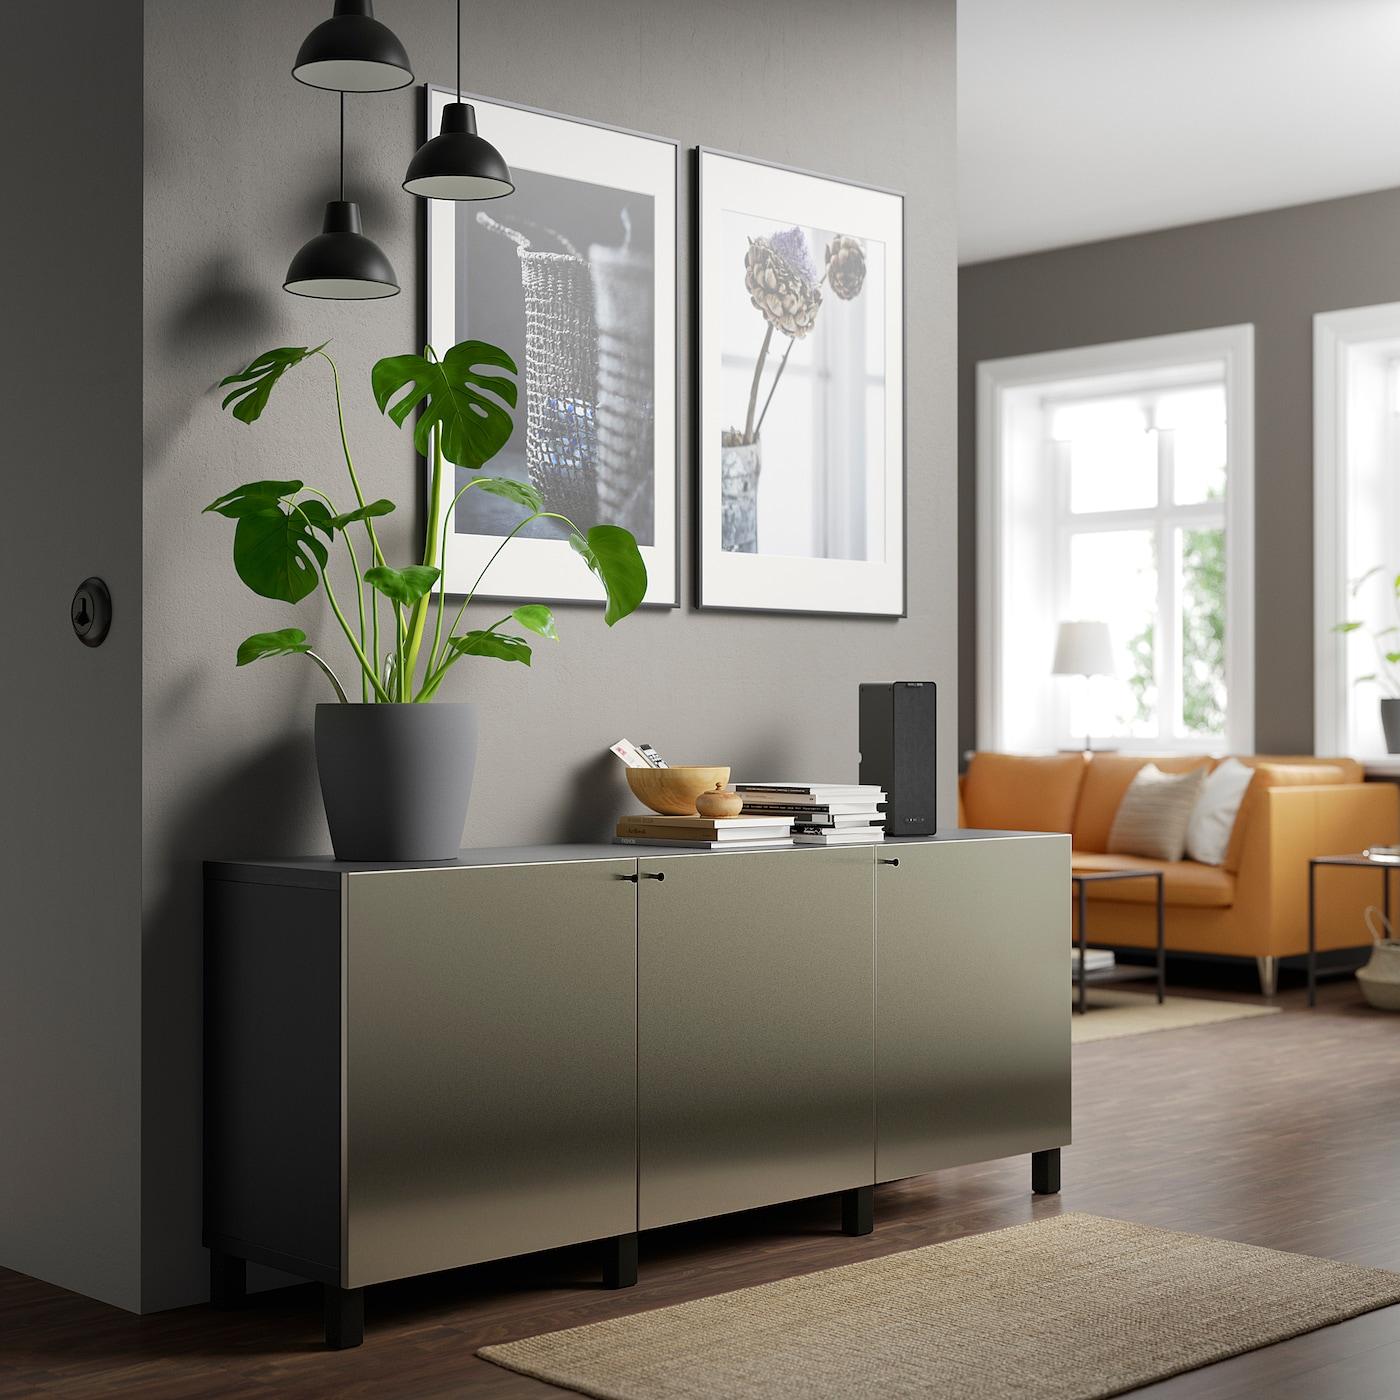 Ikea Wohnwand Besta Erfahrung